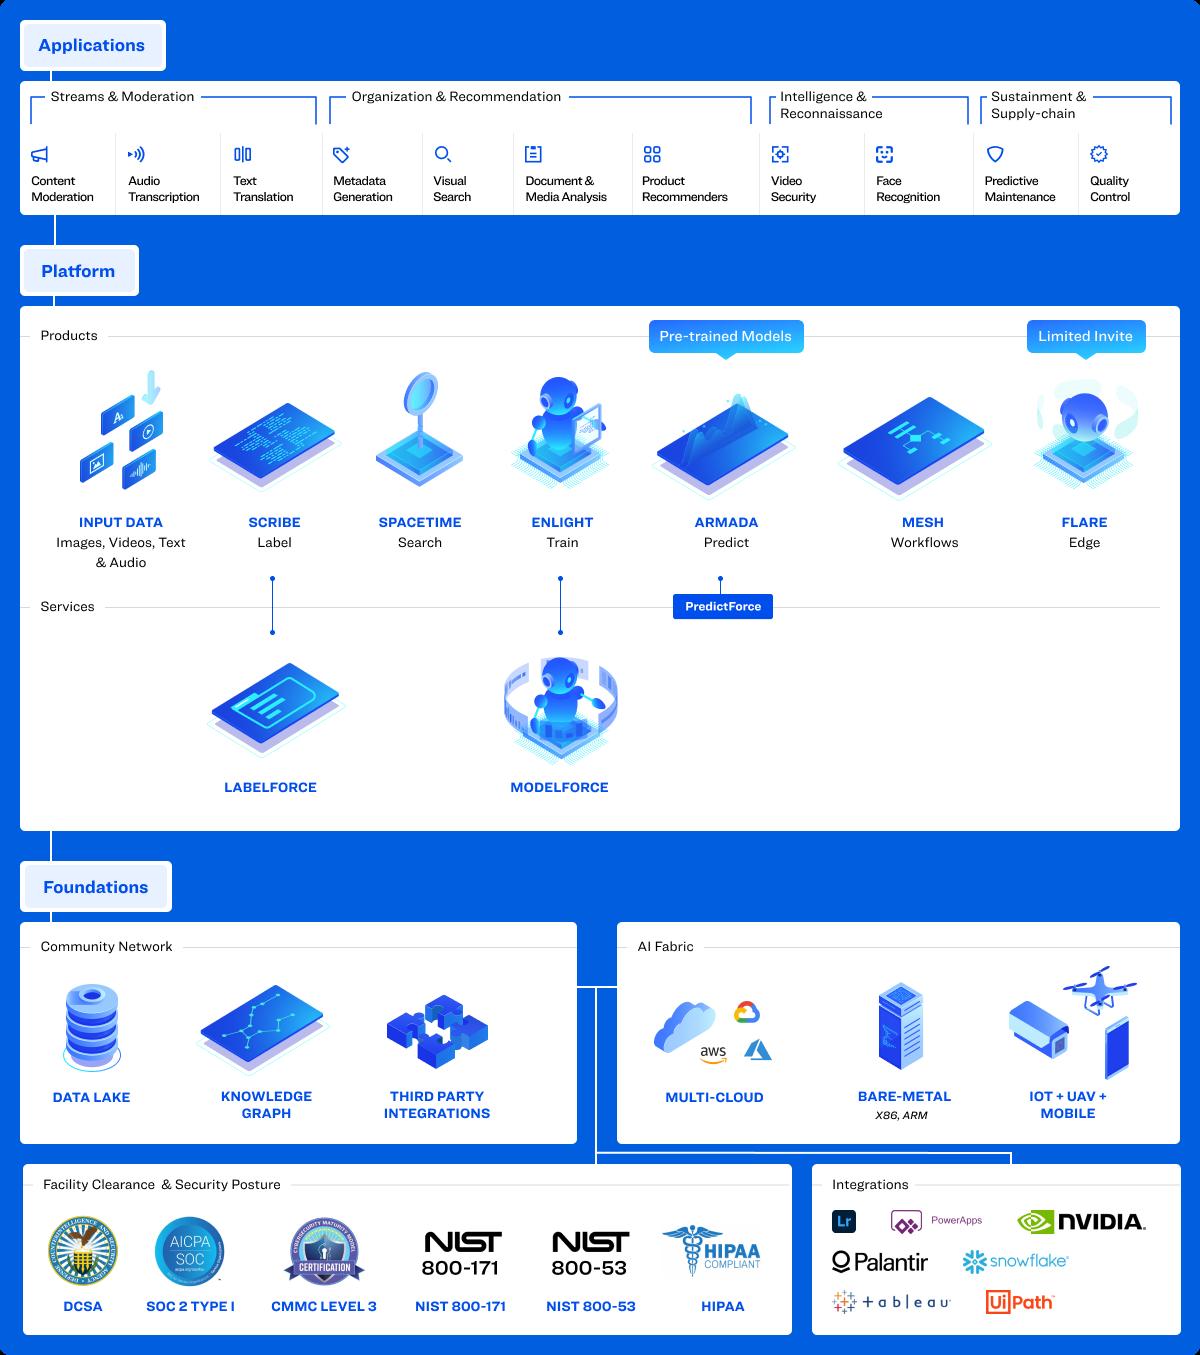 platform-clarifai-ai-integrated